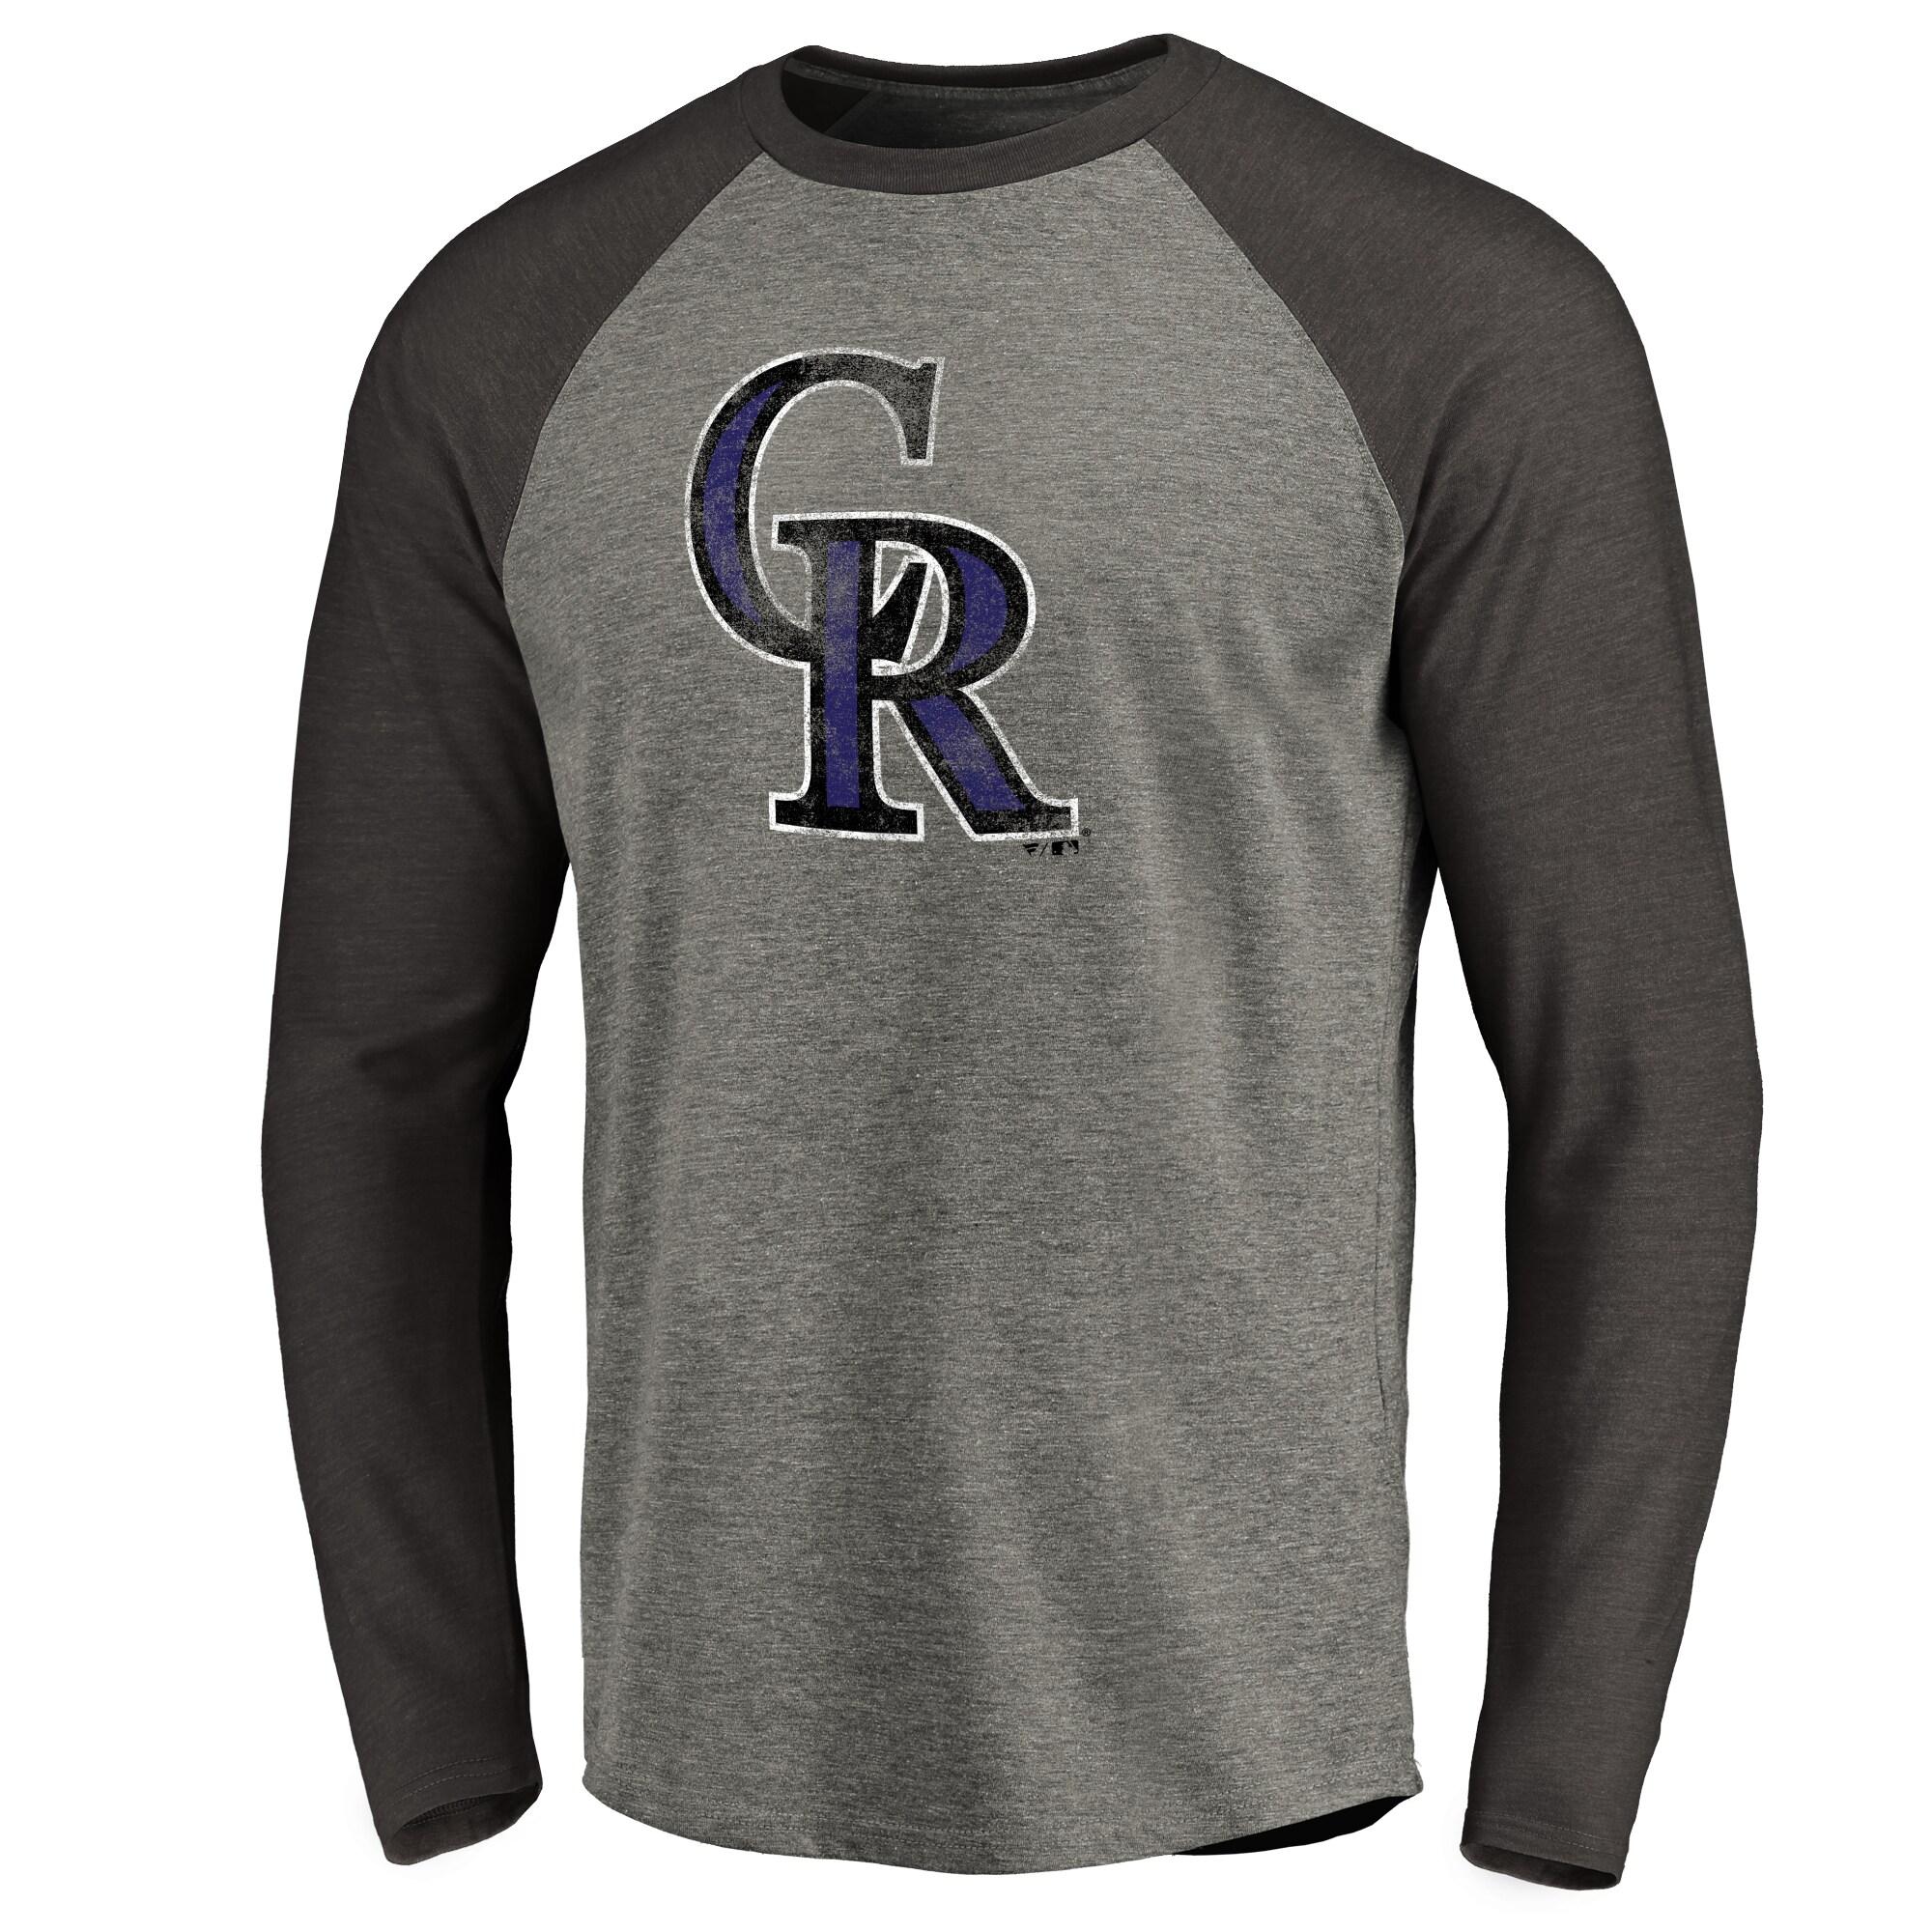 Colorado Rockies Distressed Team Raglan Tri-Blend Long Sleeve T-Shirt - Ash